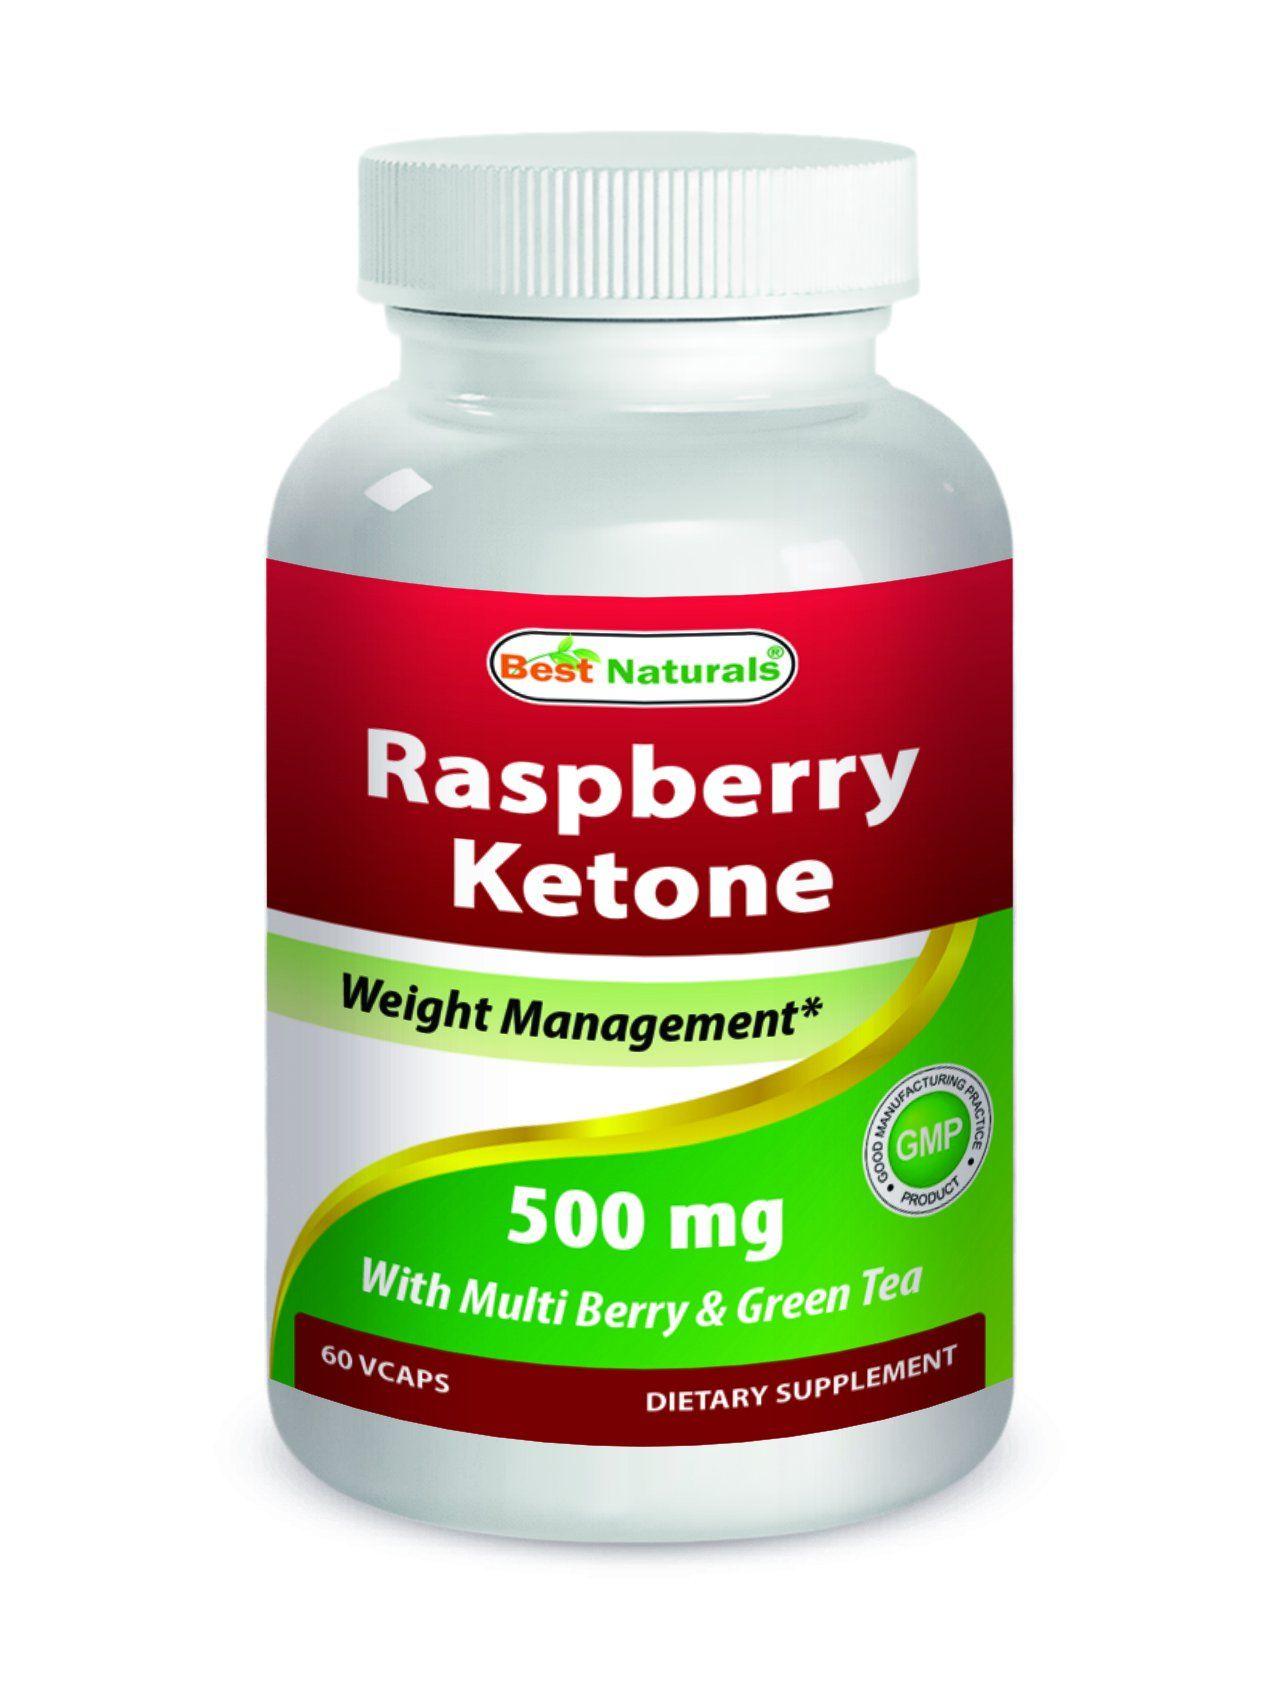 Best Naturals Raspberry Ketone 500mg 60 Veggie Capsule Click Image